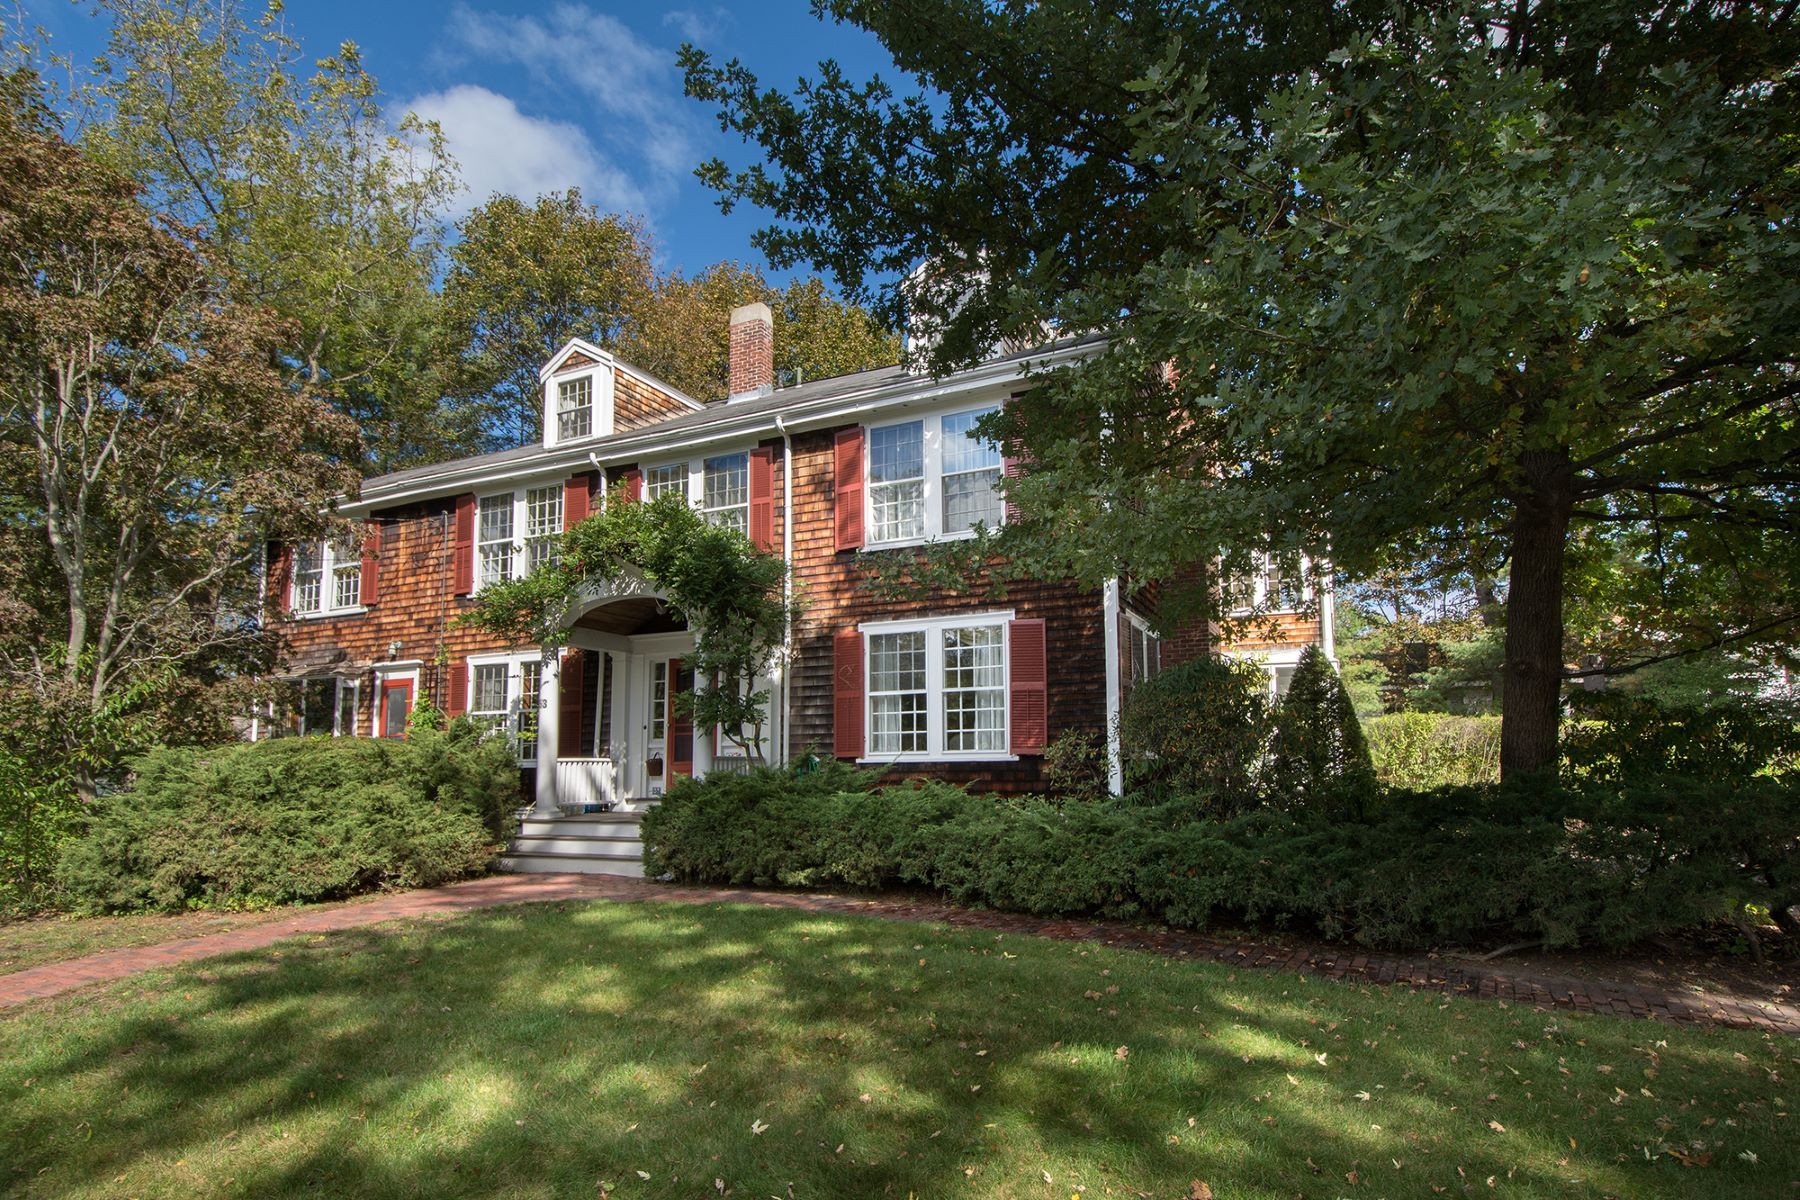 Moradia para Venda às Classic Colonial Revival 53 Fearing Road, Hingham, Massachusetts, 02043 Estados Unidos